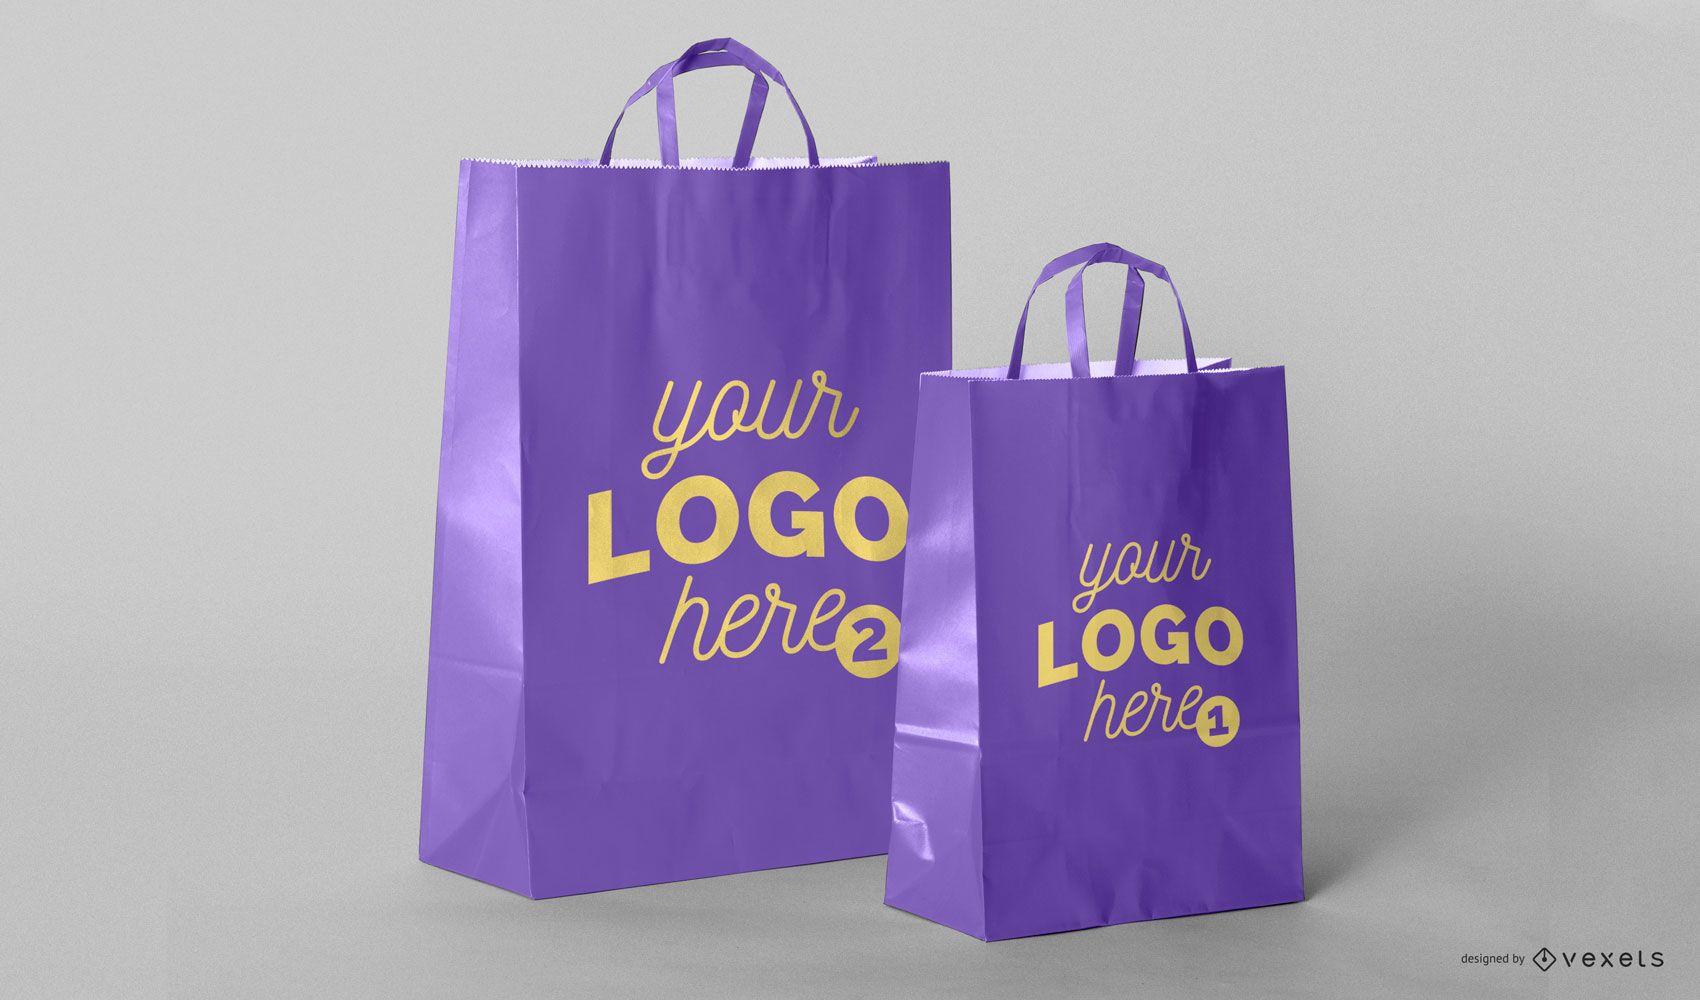 Diseño de maqueta de bolsas de compras.